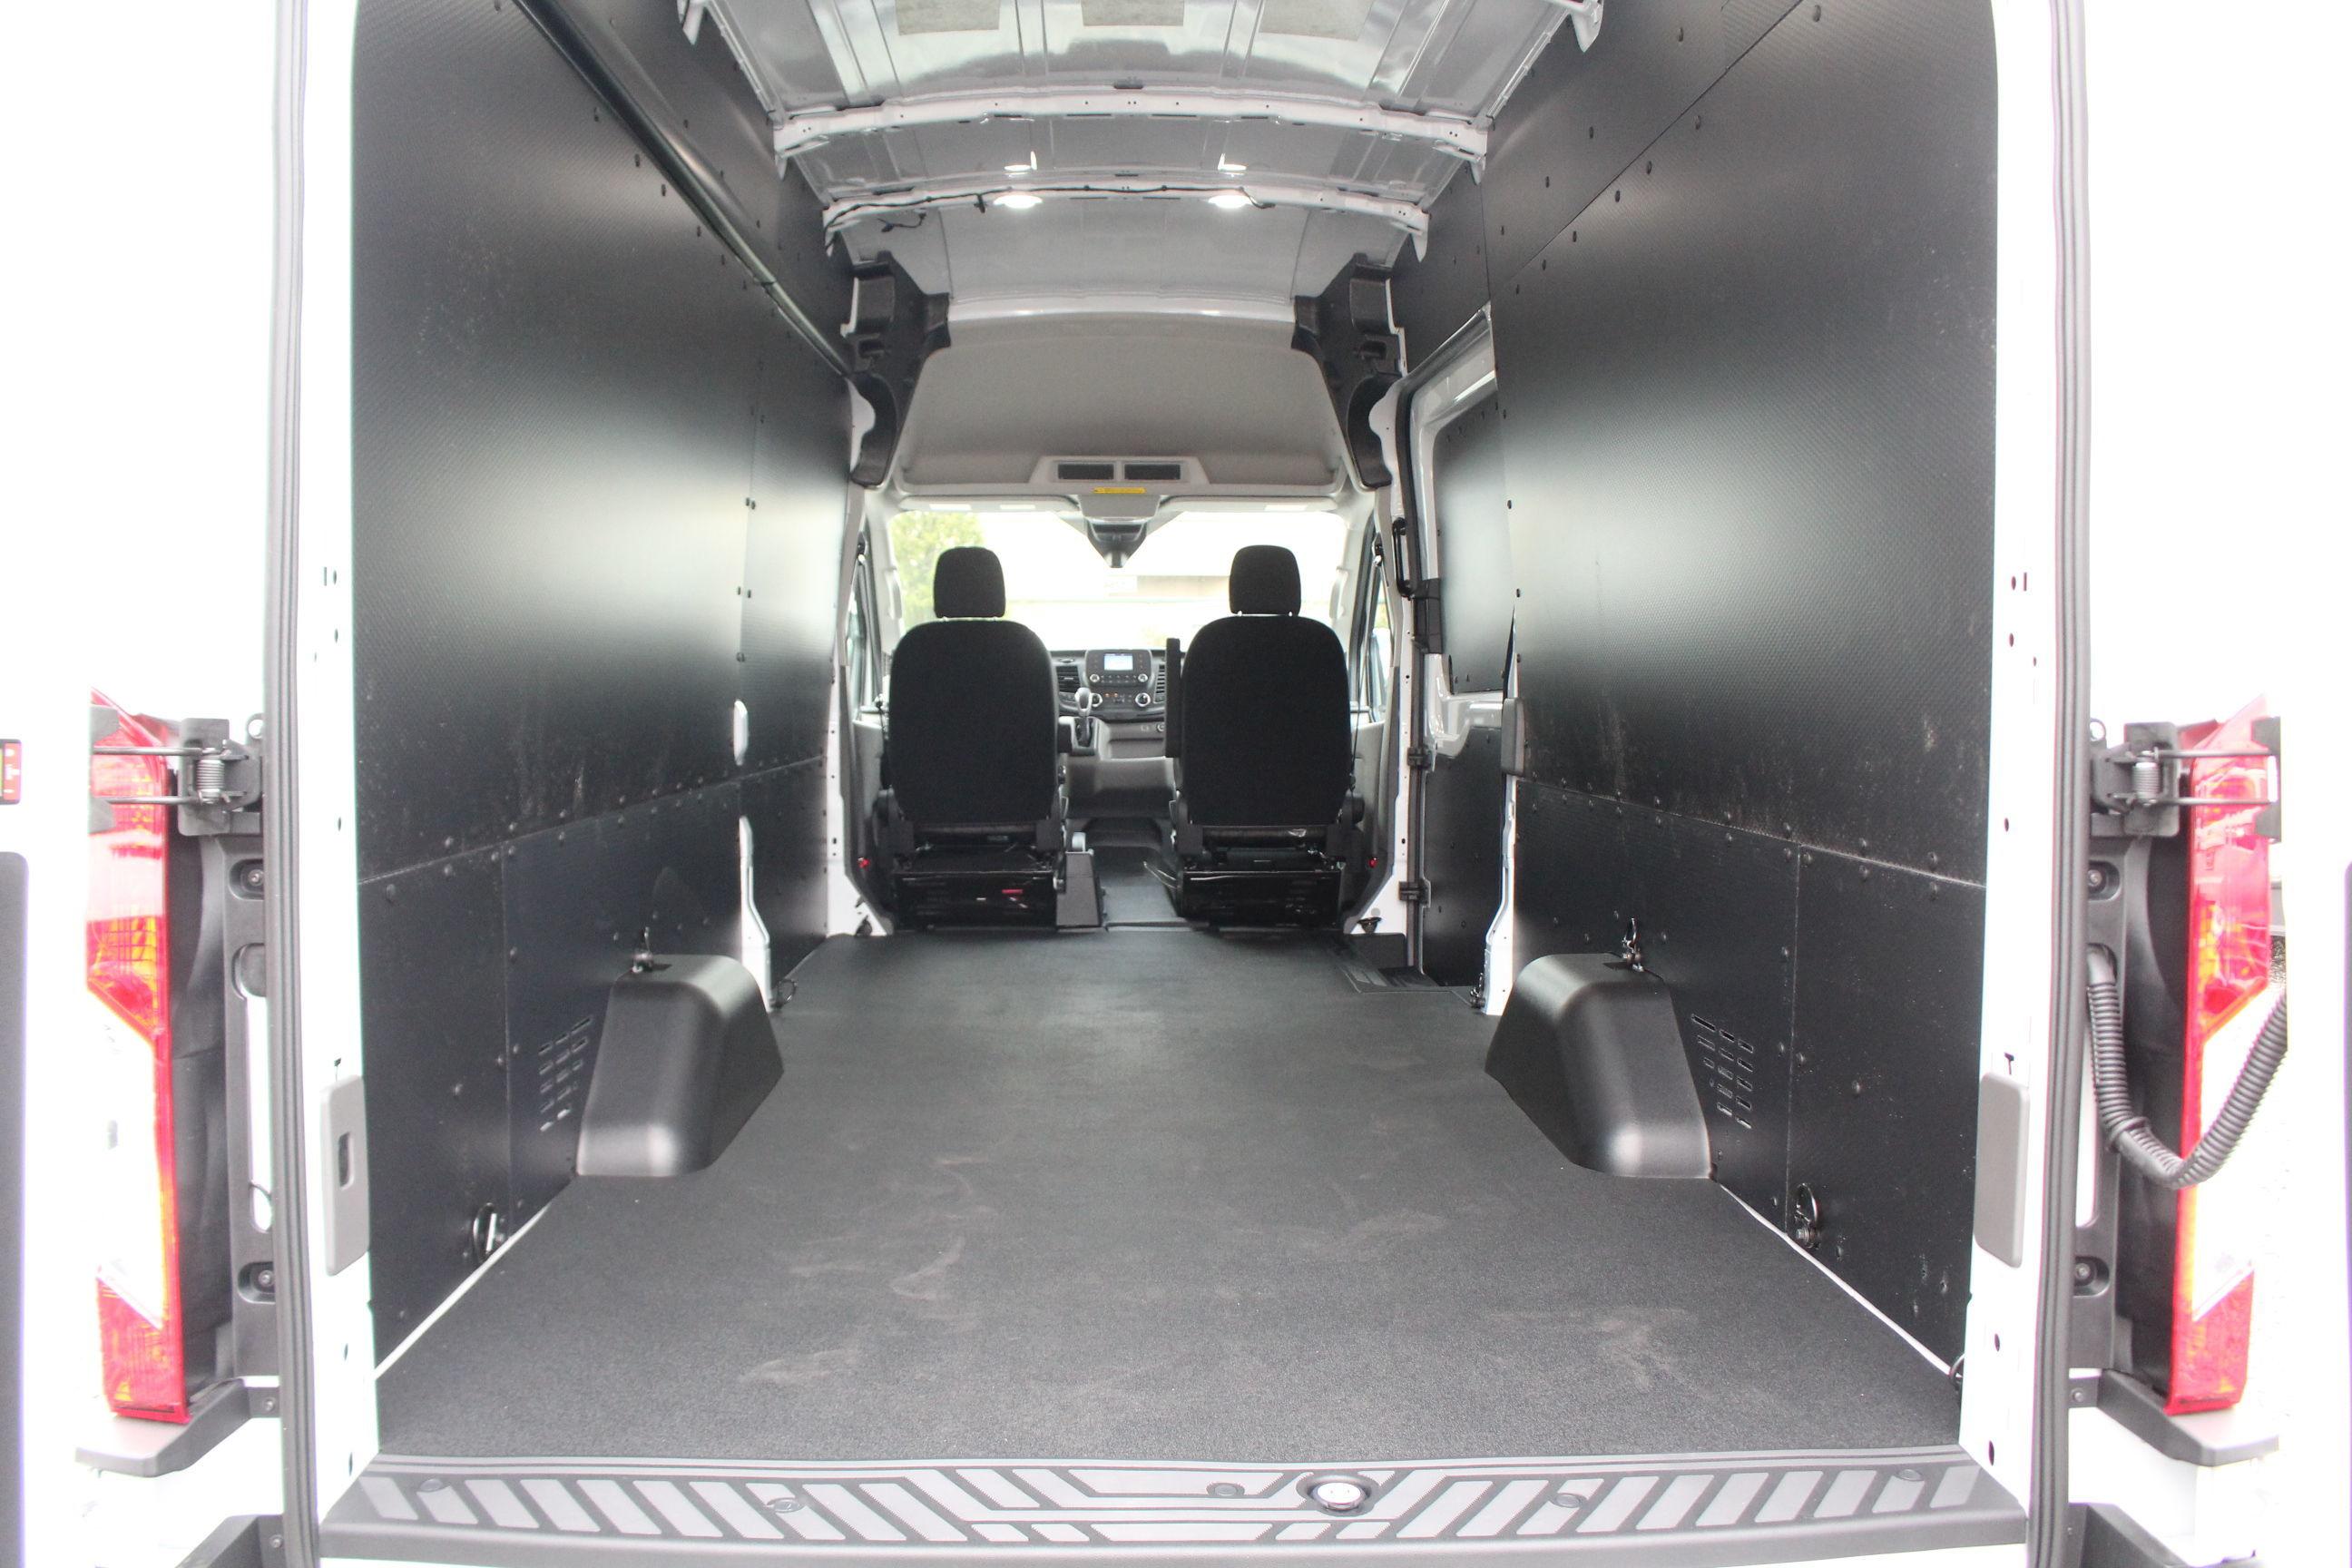 2020 Transit 350 High Roof RWD, Empty Cargo Van #E9278 - photo 1